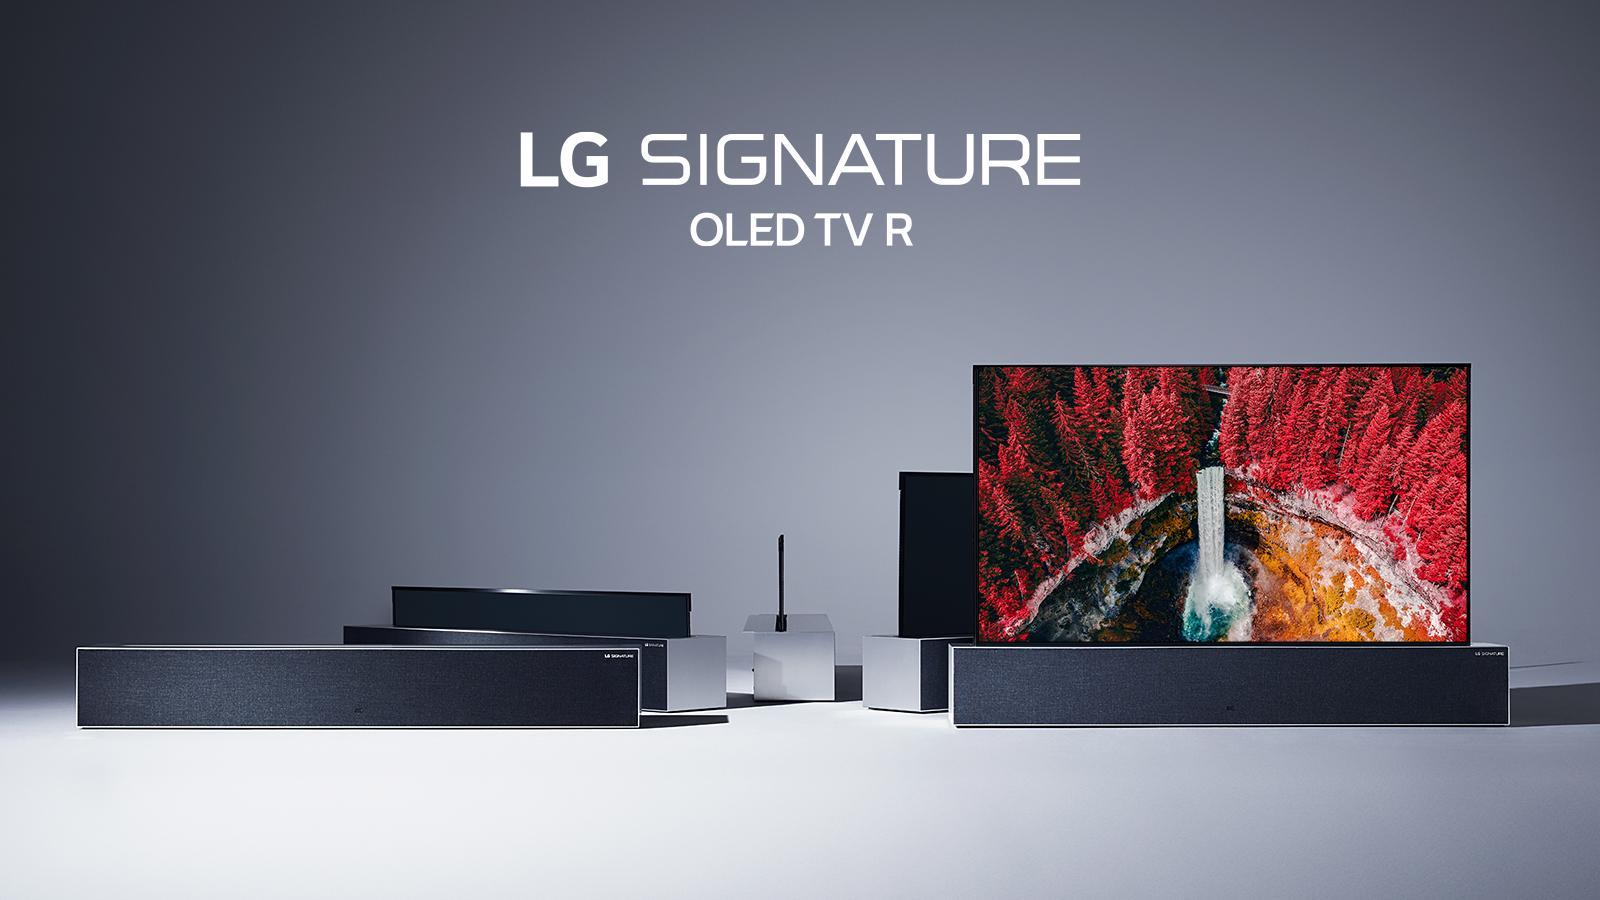 Smart TV LG OLED 65R9PUA : Ecran TV Enroulable Signature R9